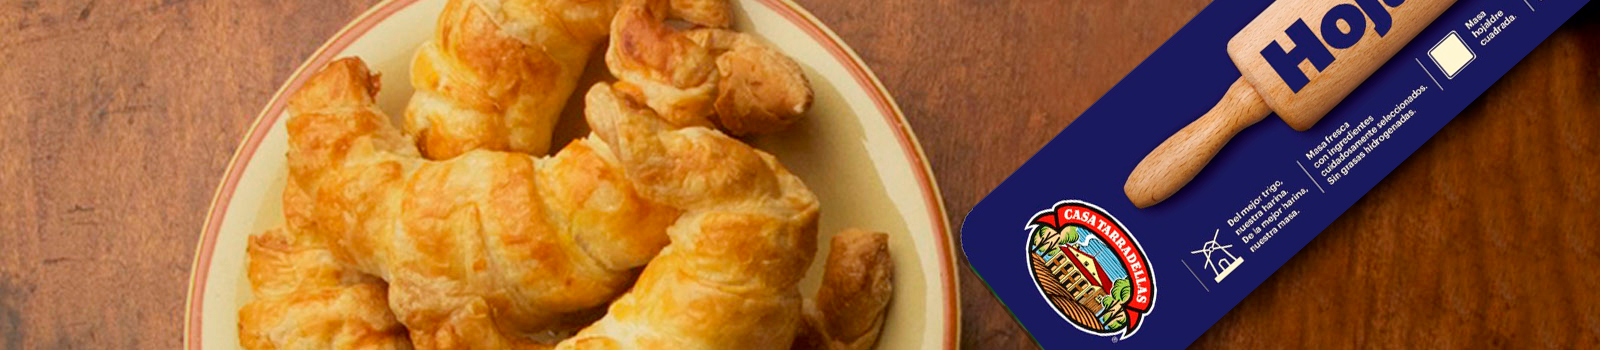 hd-hojaldre-croissants